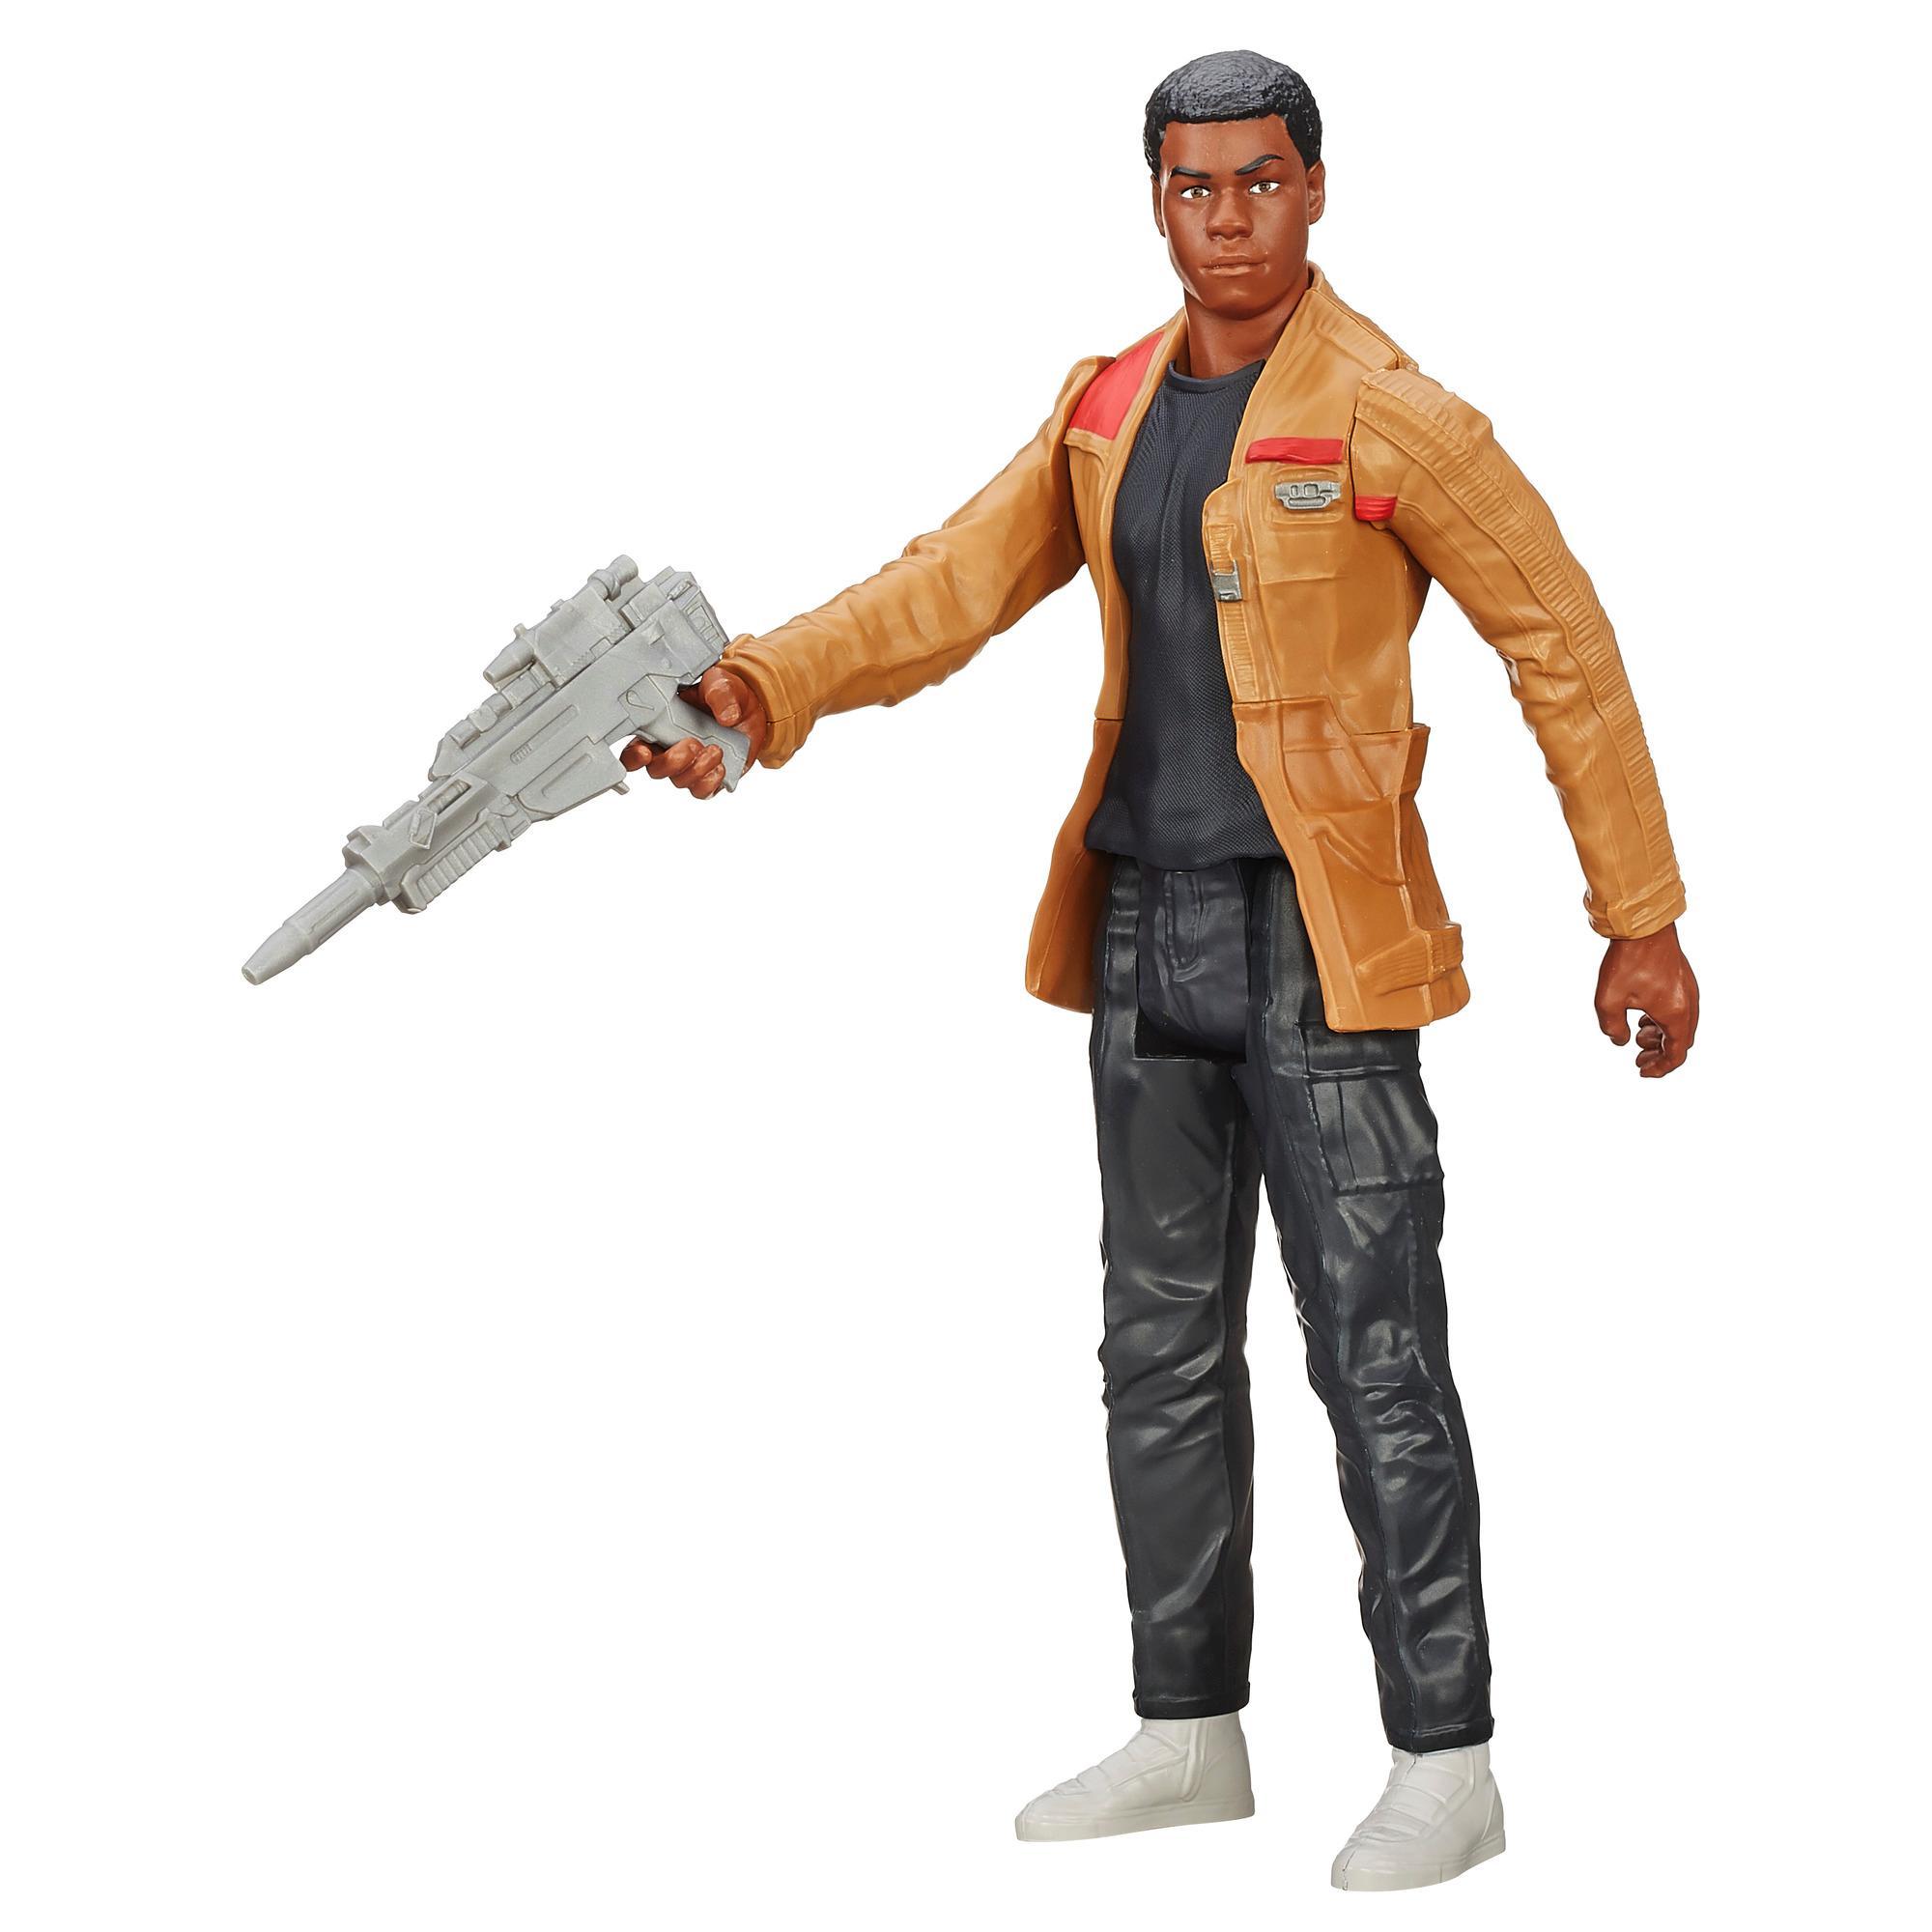 STAR WARS E7 figurka 30 cm Finn (Jakku)